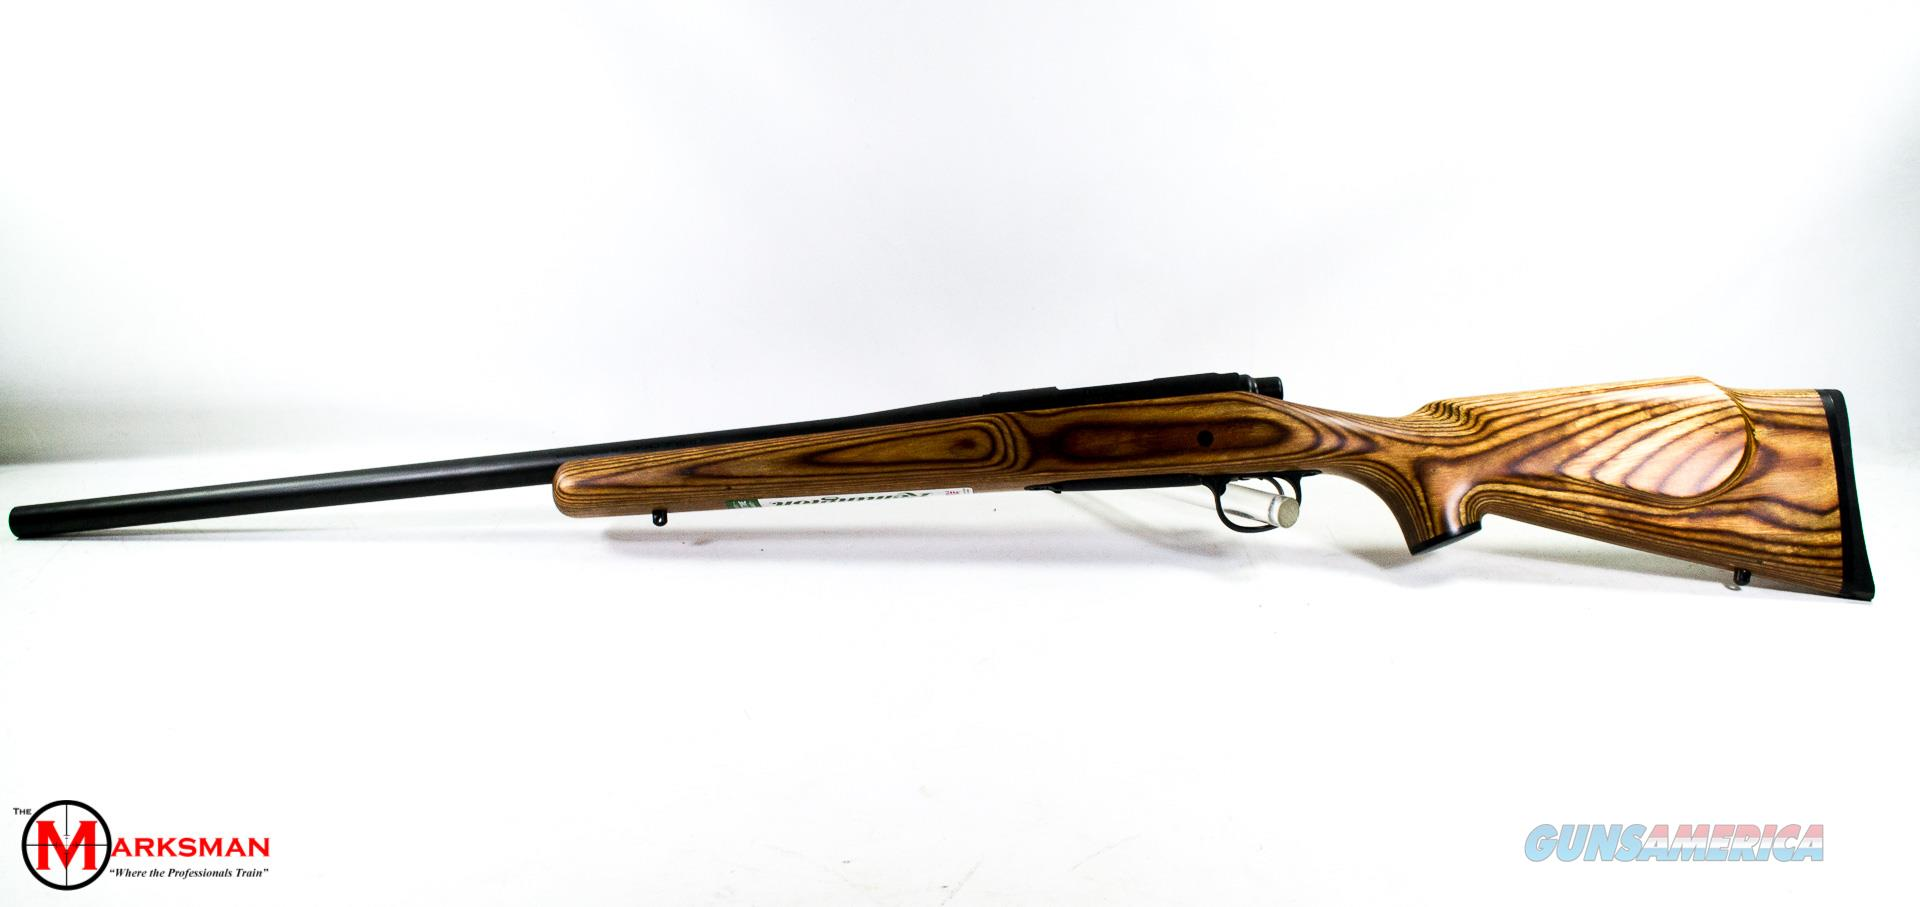 Remington 700 Varmint, .223 Remington NEW 27491  Guns > Rifles > Remington Rifles - Modern > Model 700 > Sporting